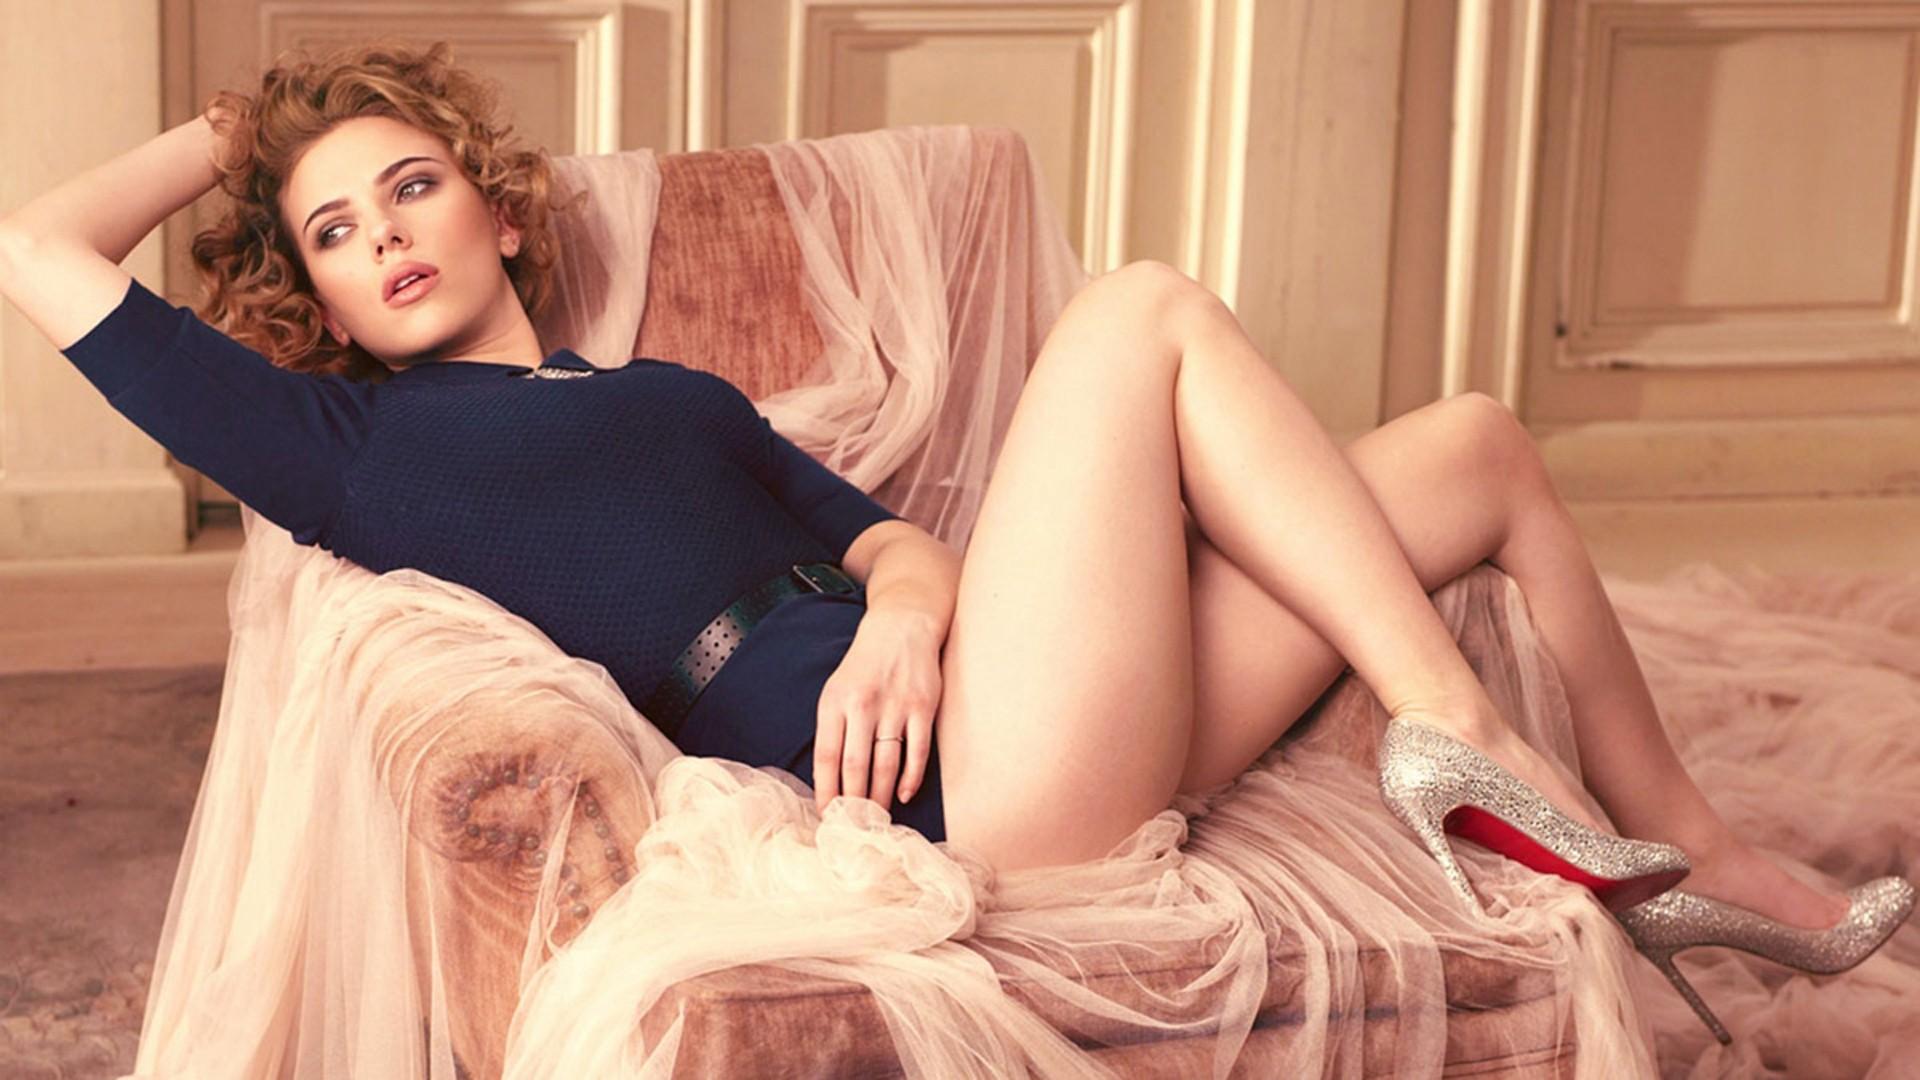 WELCOME TO THE POPUHEADS FORUM! - Página 7 Scarlett-Johansson-Hot-HD-Wallpaper